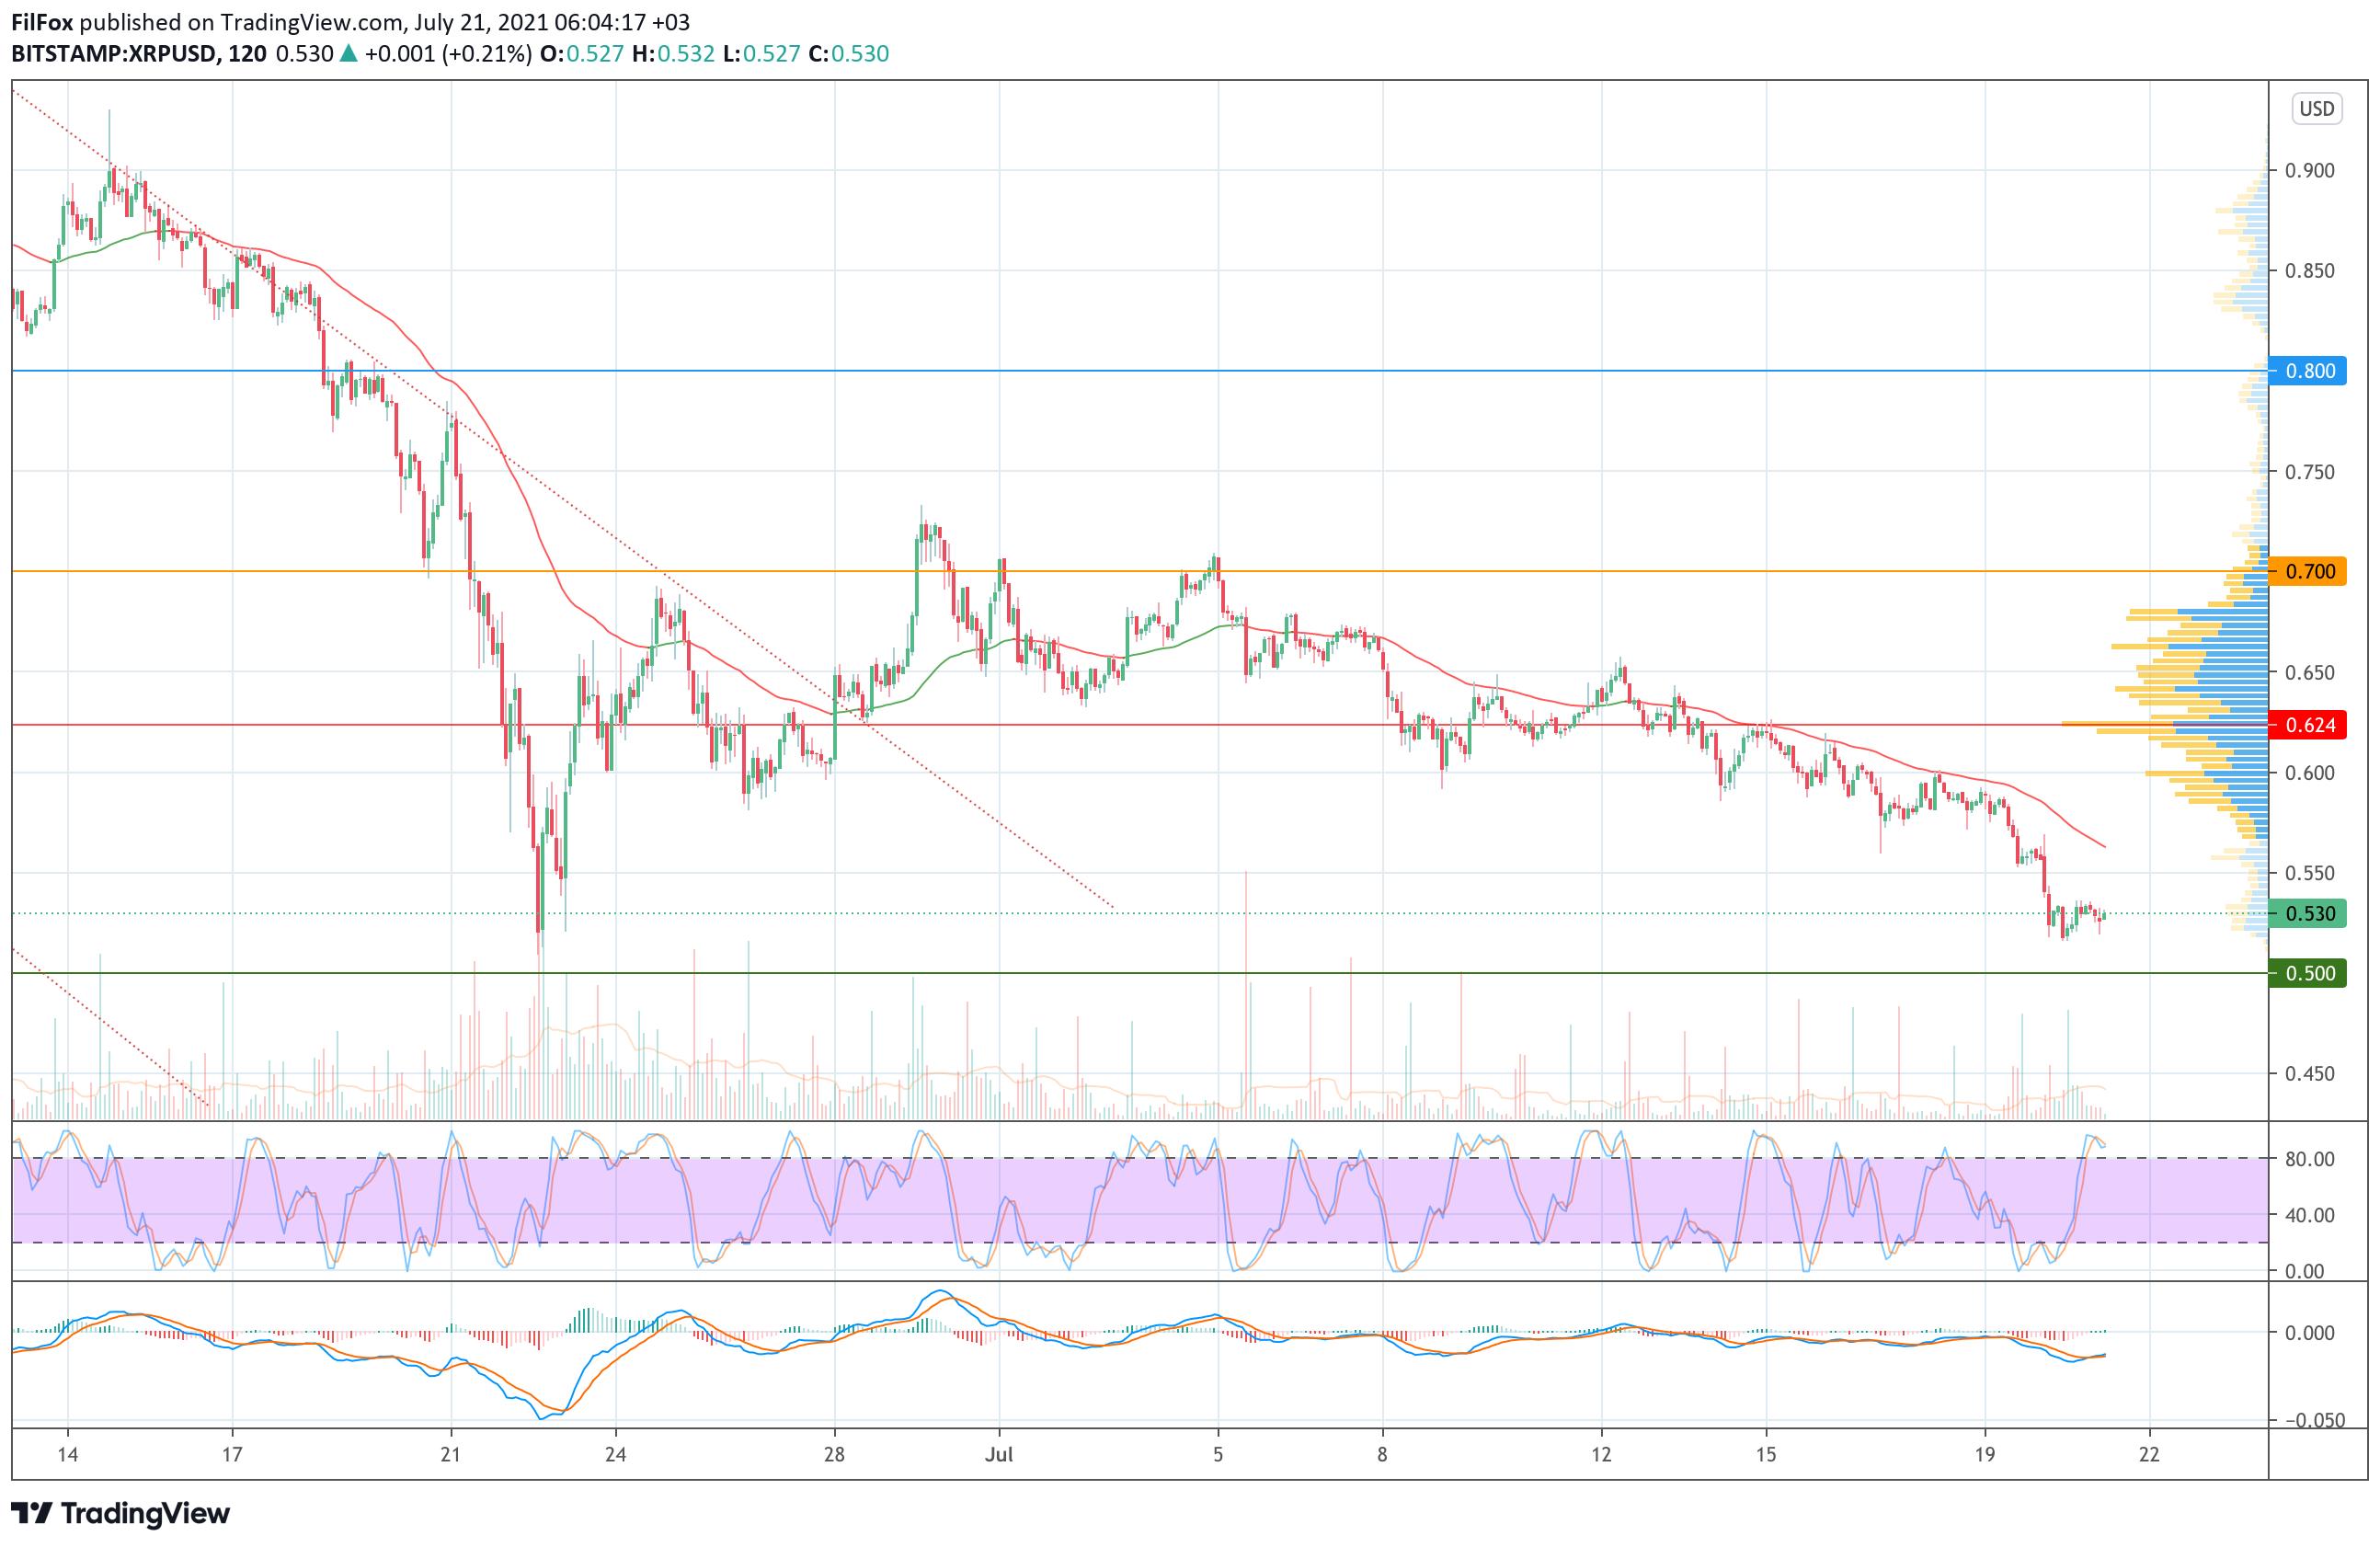 Анализ цен Bitcoin, Ethereum, XRP на 21.07.2021